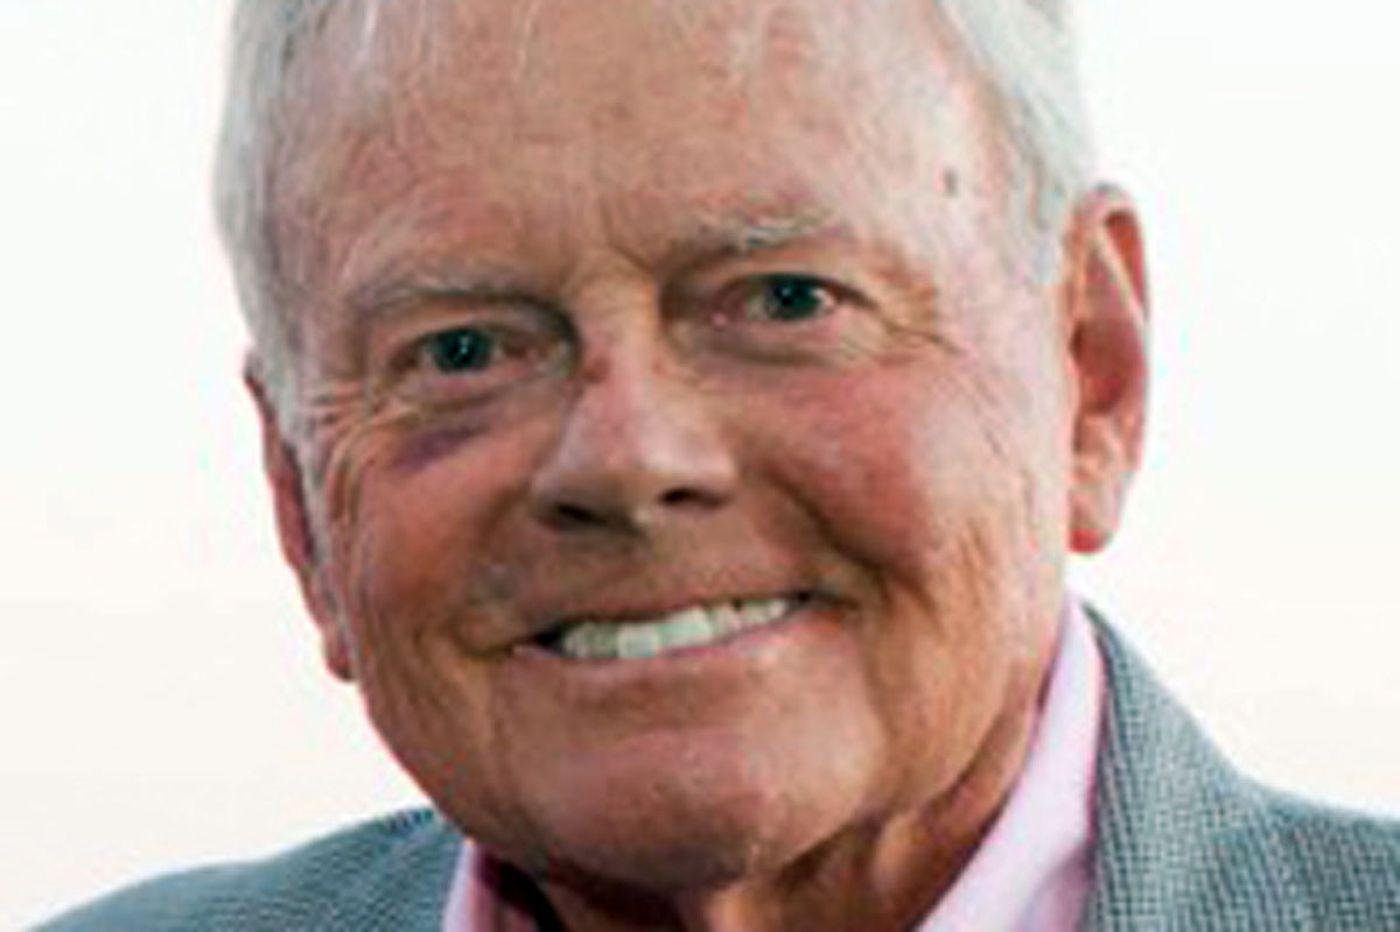 William J. Hammer, 71, cardiologist